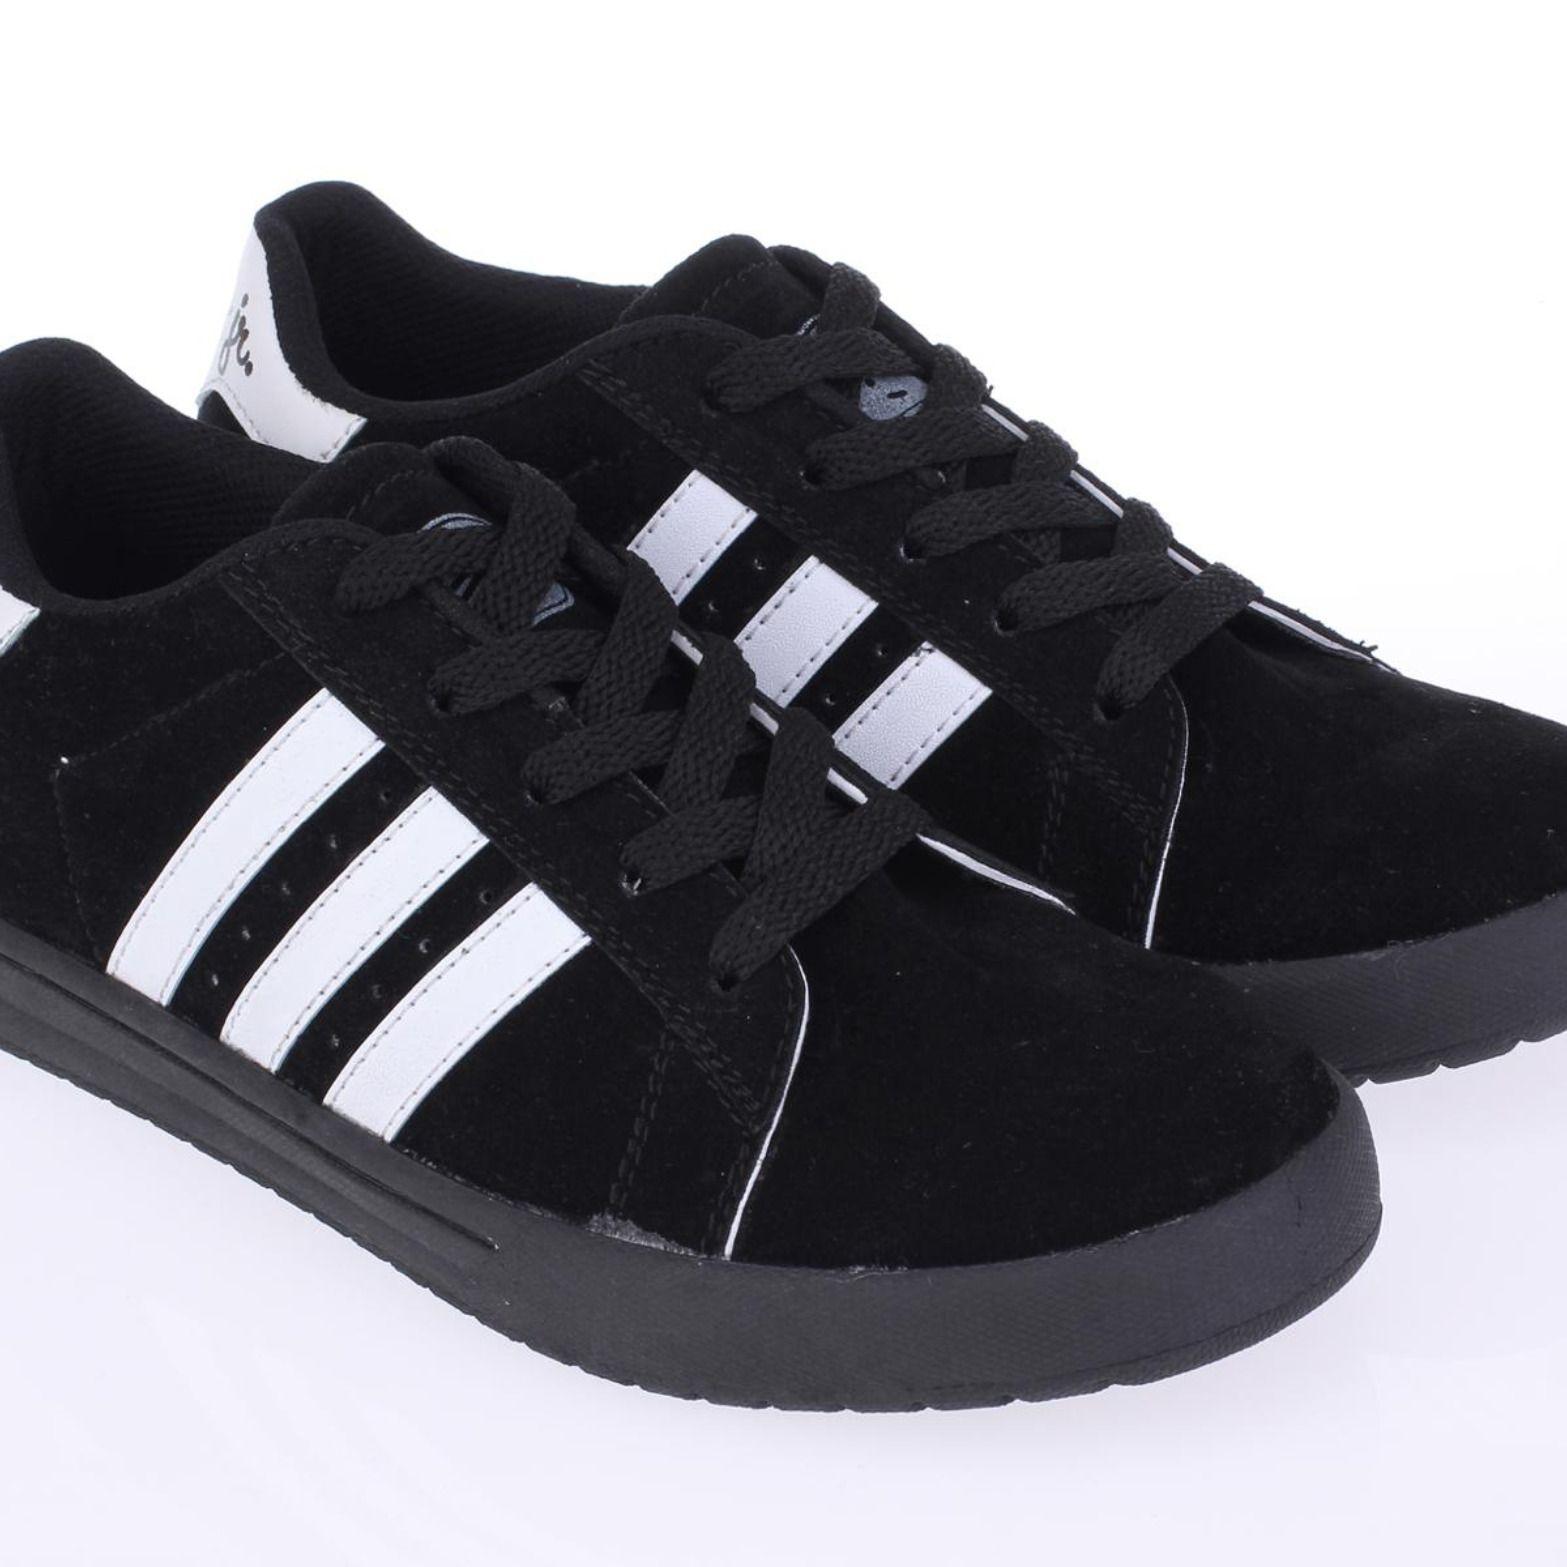 Sepatu Futsal Anak Laki Laki Cns 070 Bosen Dengan Produk Fashion